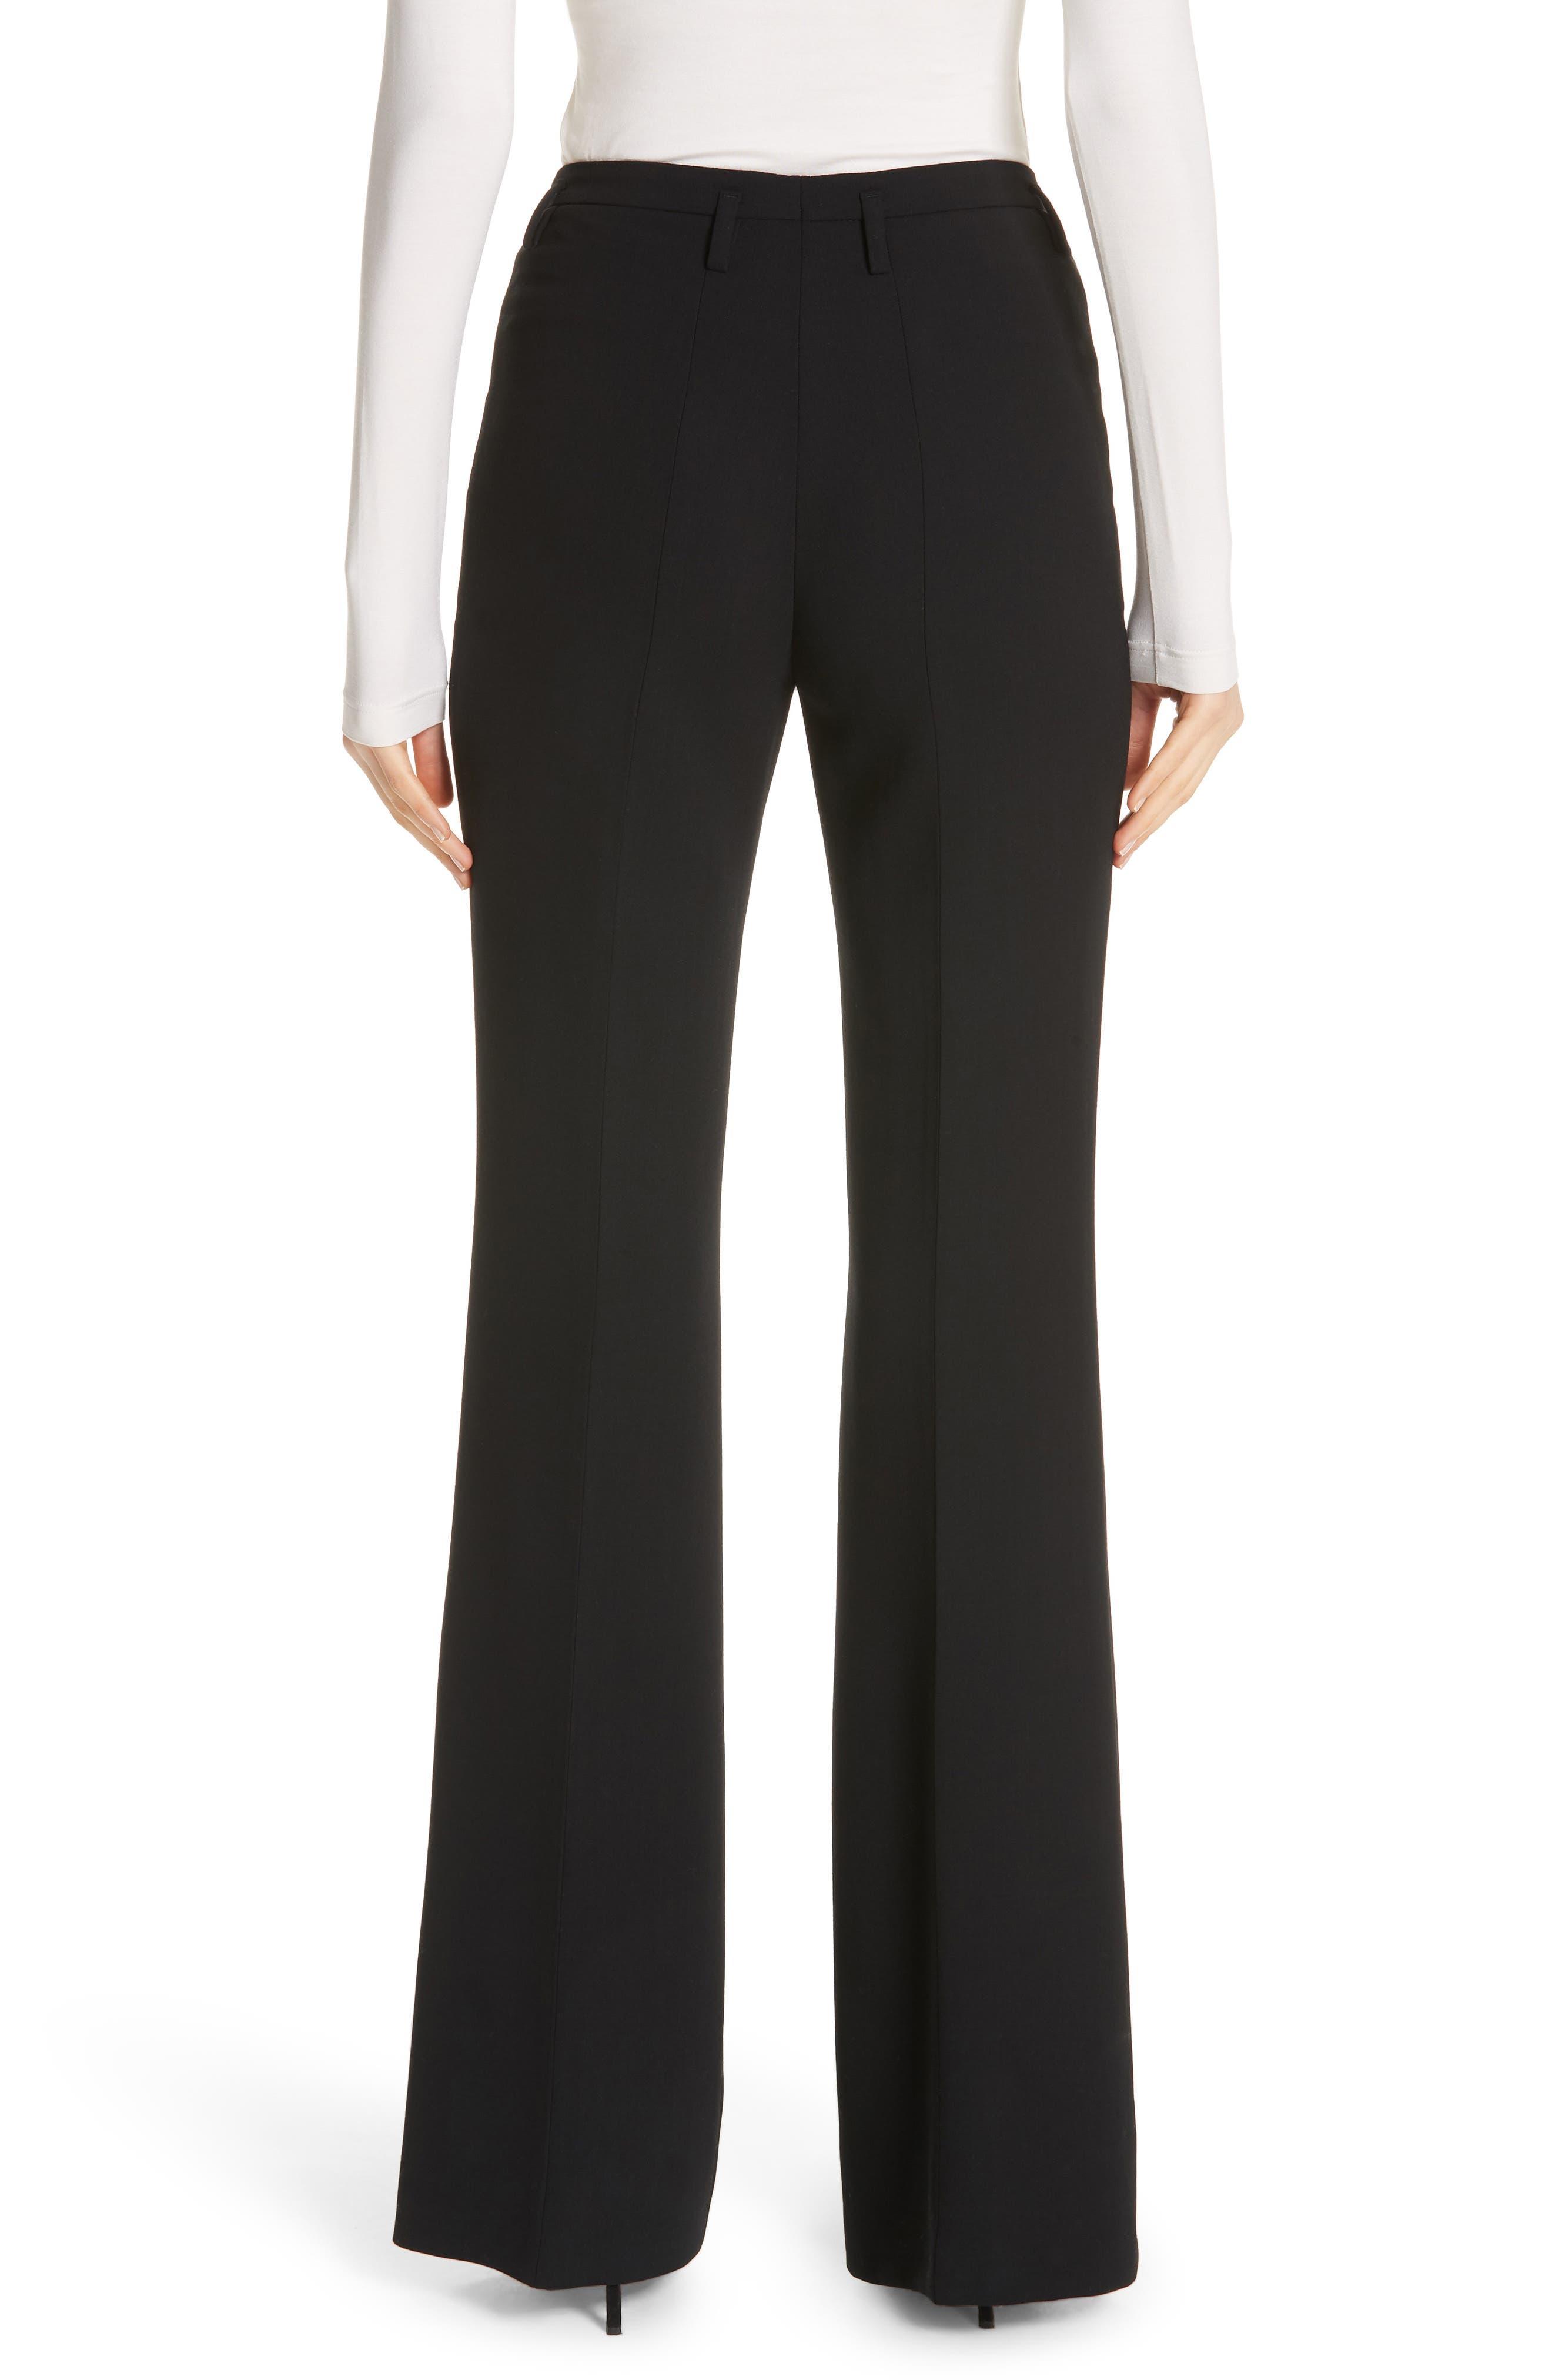 Farrah Stretch Wool Flare Pants,                             Alternate thumbnail 2, color,                             BLACK